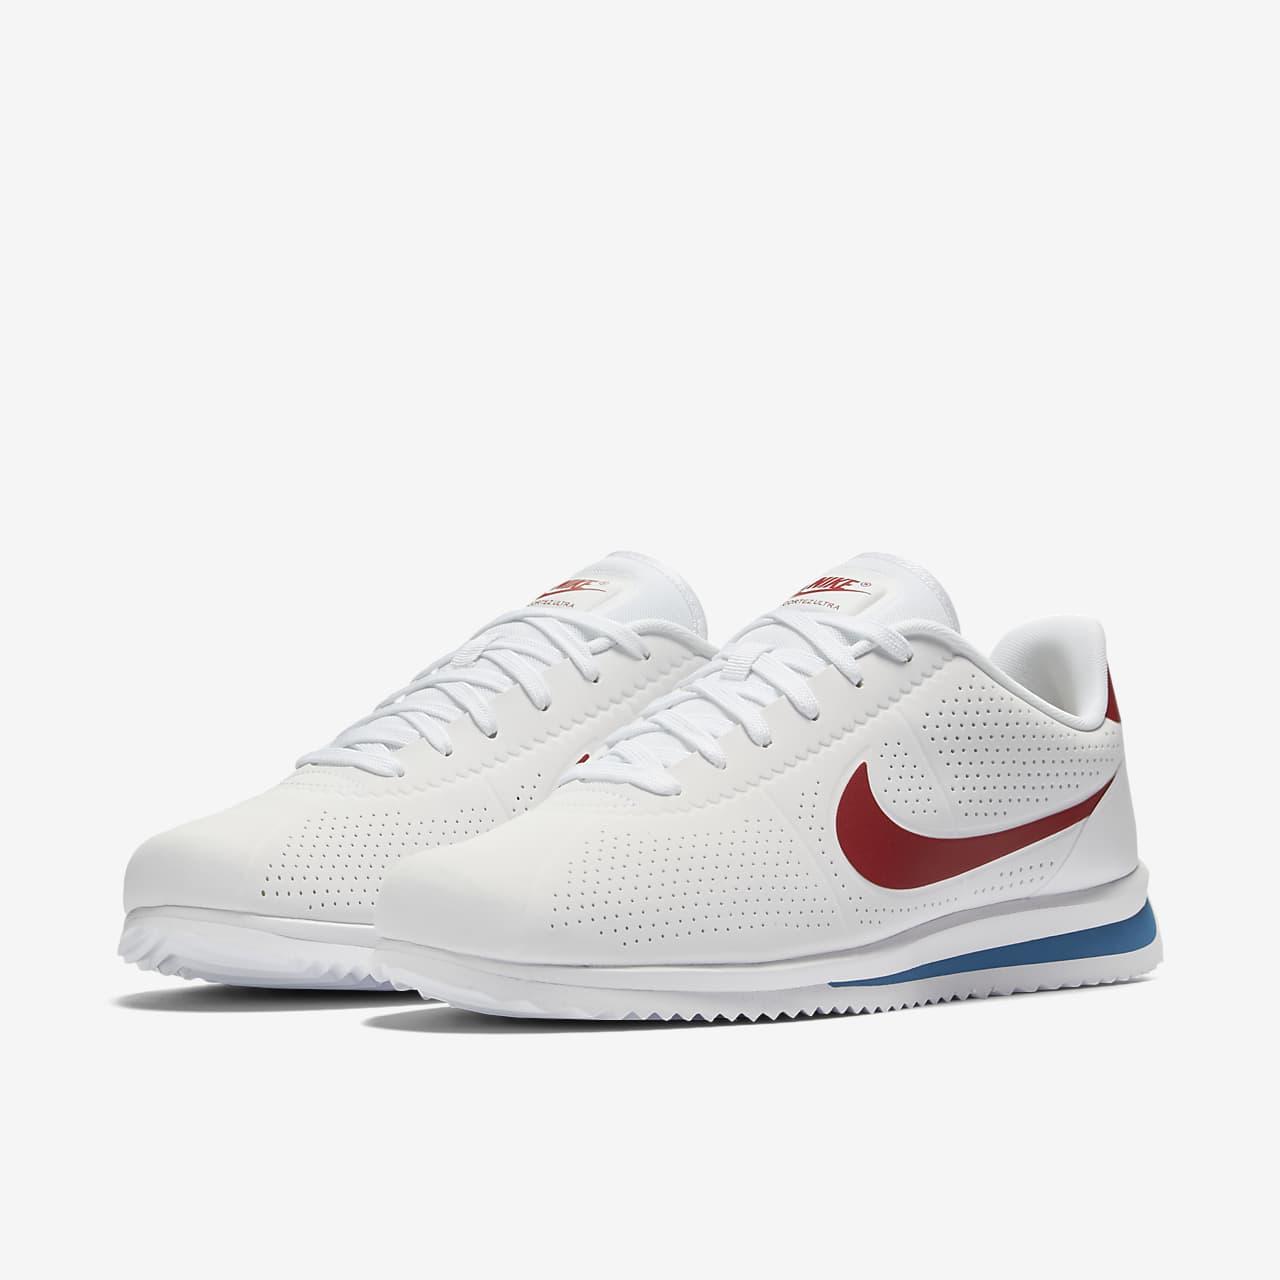 deuda Muelle del puente caballo de fuerza  Nike Cortez Ultra Moire Men's Shoe. Nike SE